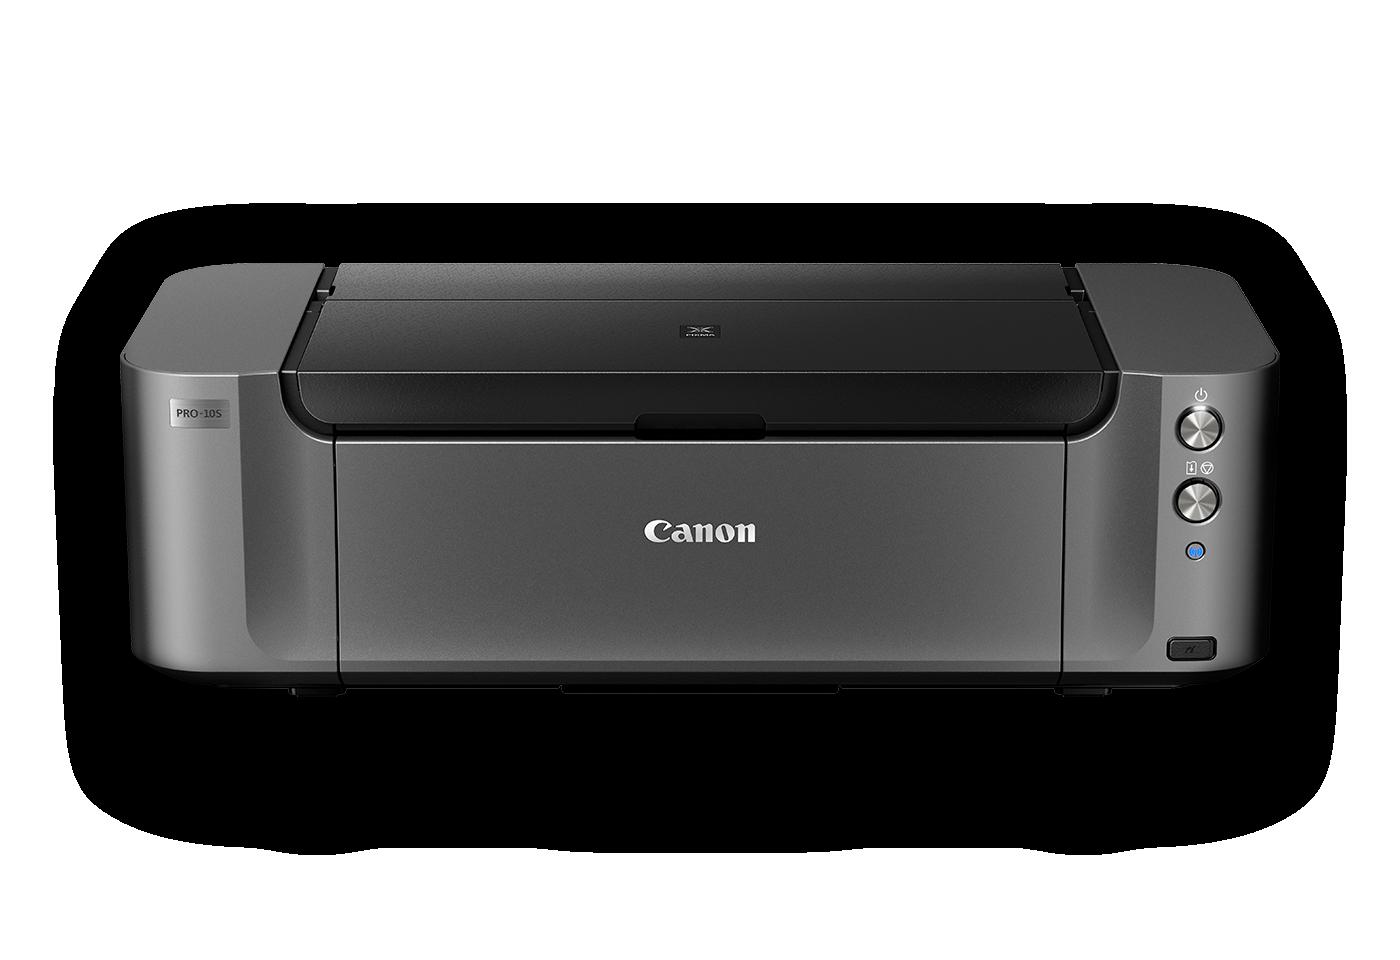 Image CANON Pixma Pro 10s - Labo FNAC